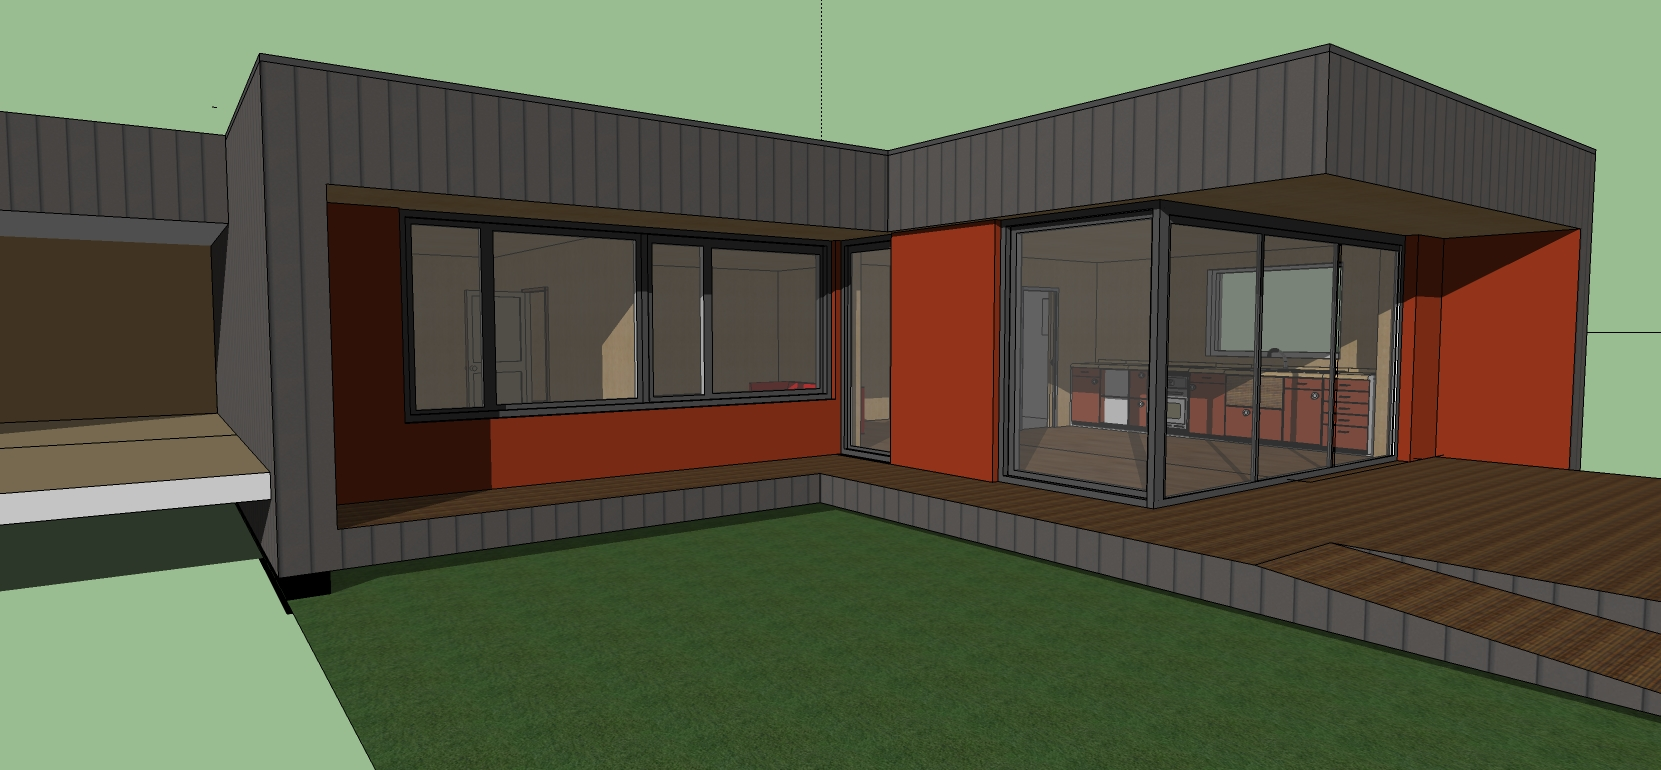 alain henry architecte penvenan c tes d 39 armor ordre des architectes. Black Bedroom Furniture Sets. Home Design Ideas